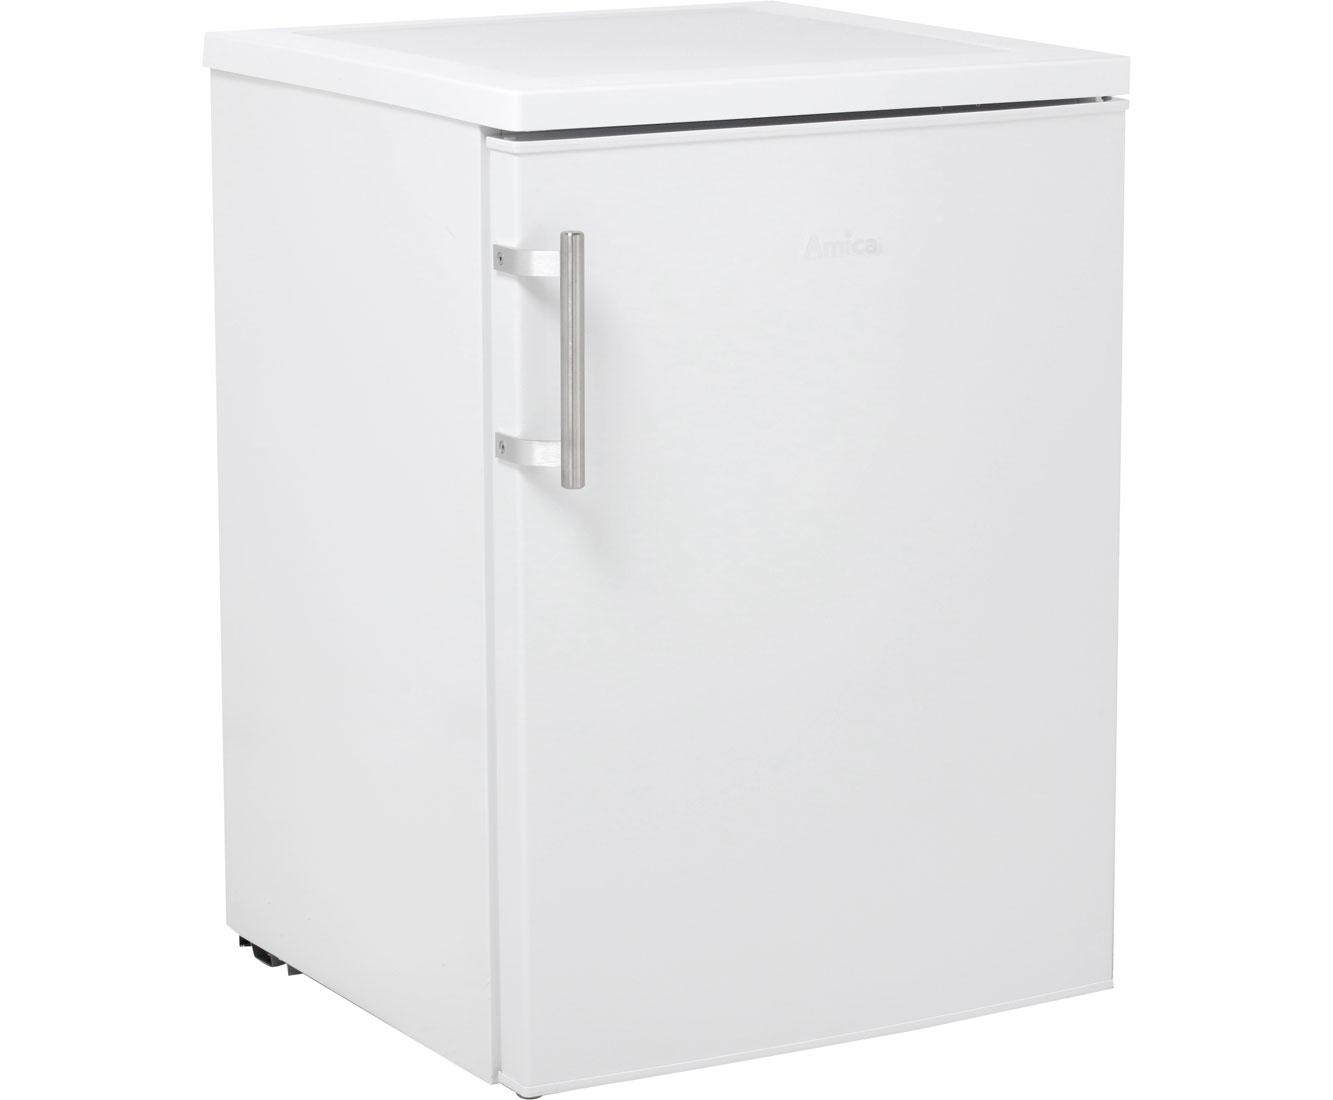 Retro Kühlschrank Amica : Amica ks w kühlschrank weiß a